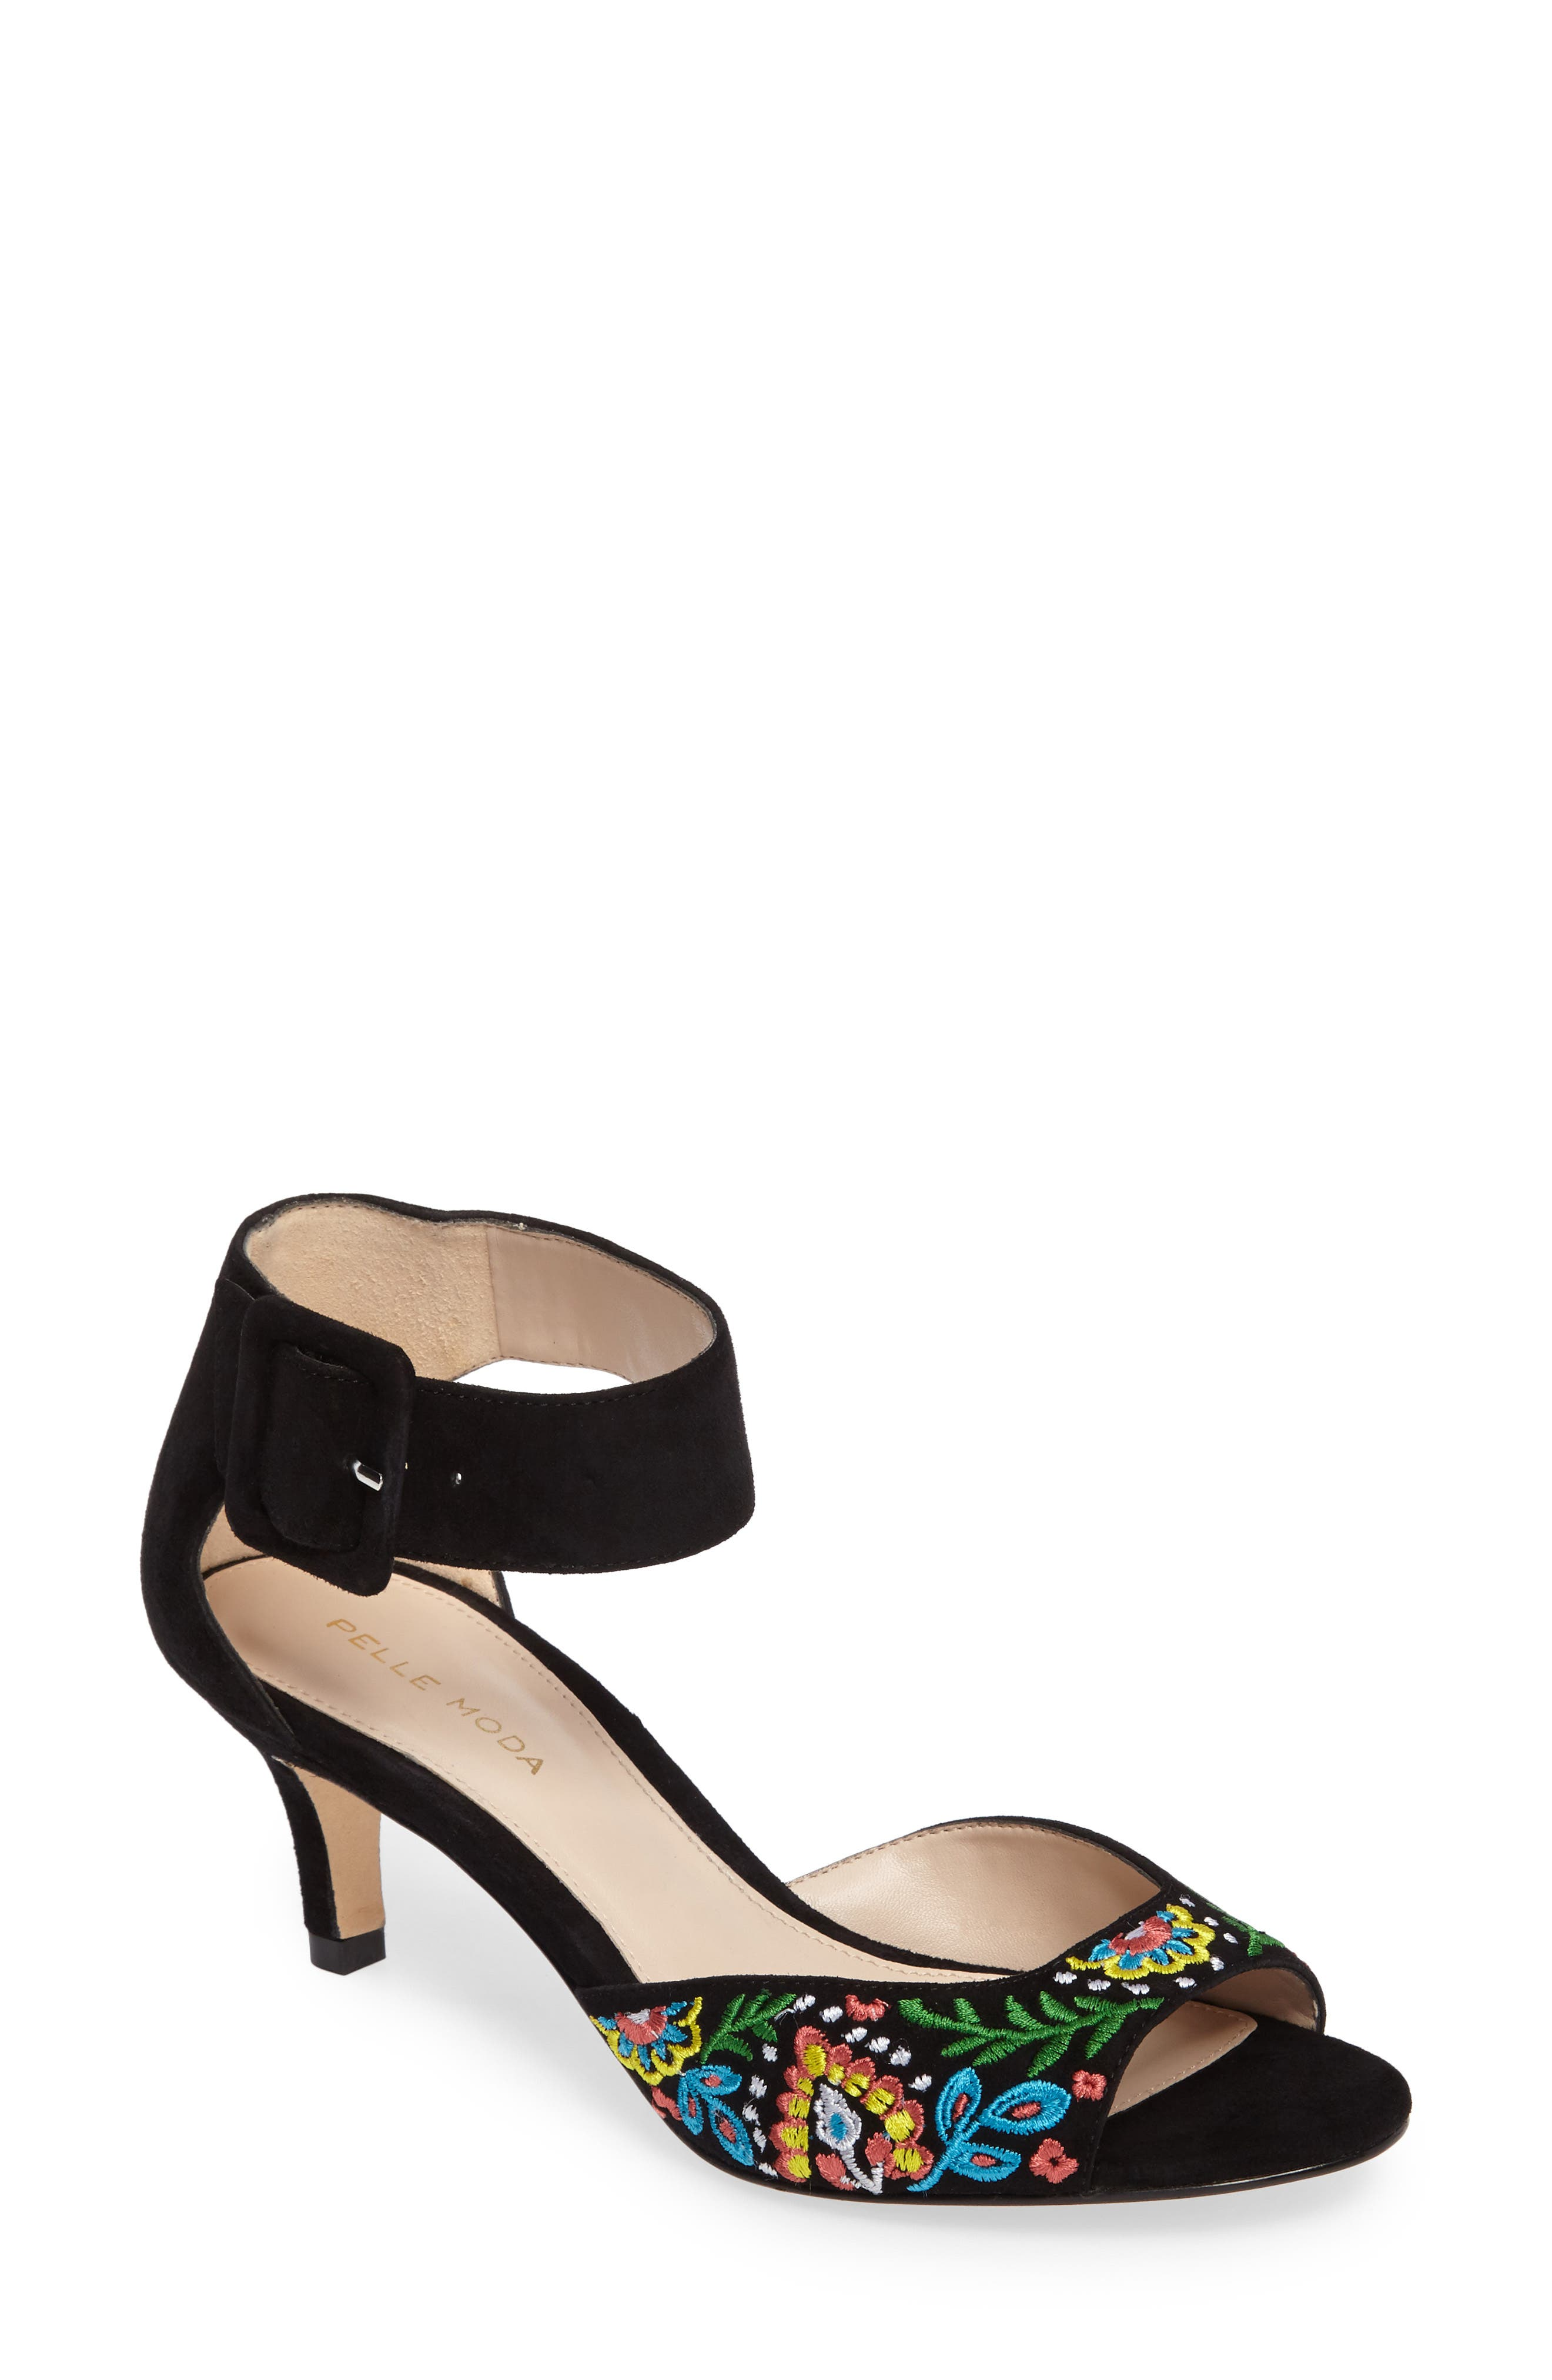 Main Image - Pelle Moda 'Berlin' Sandal (Women)